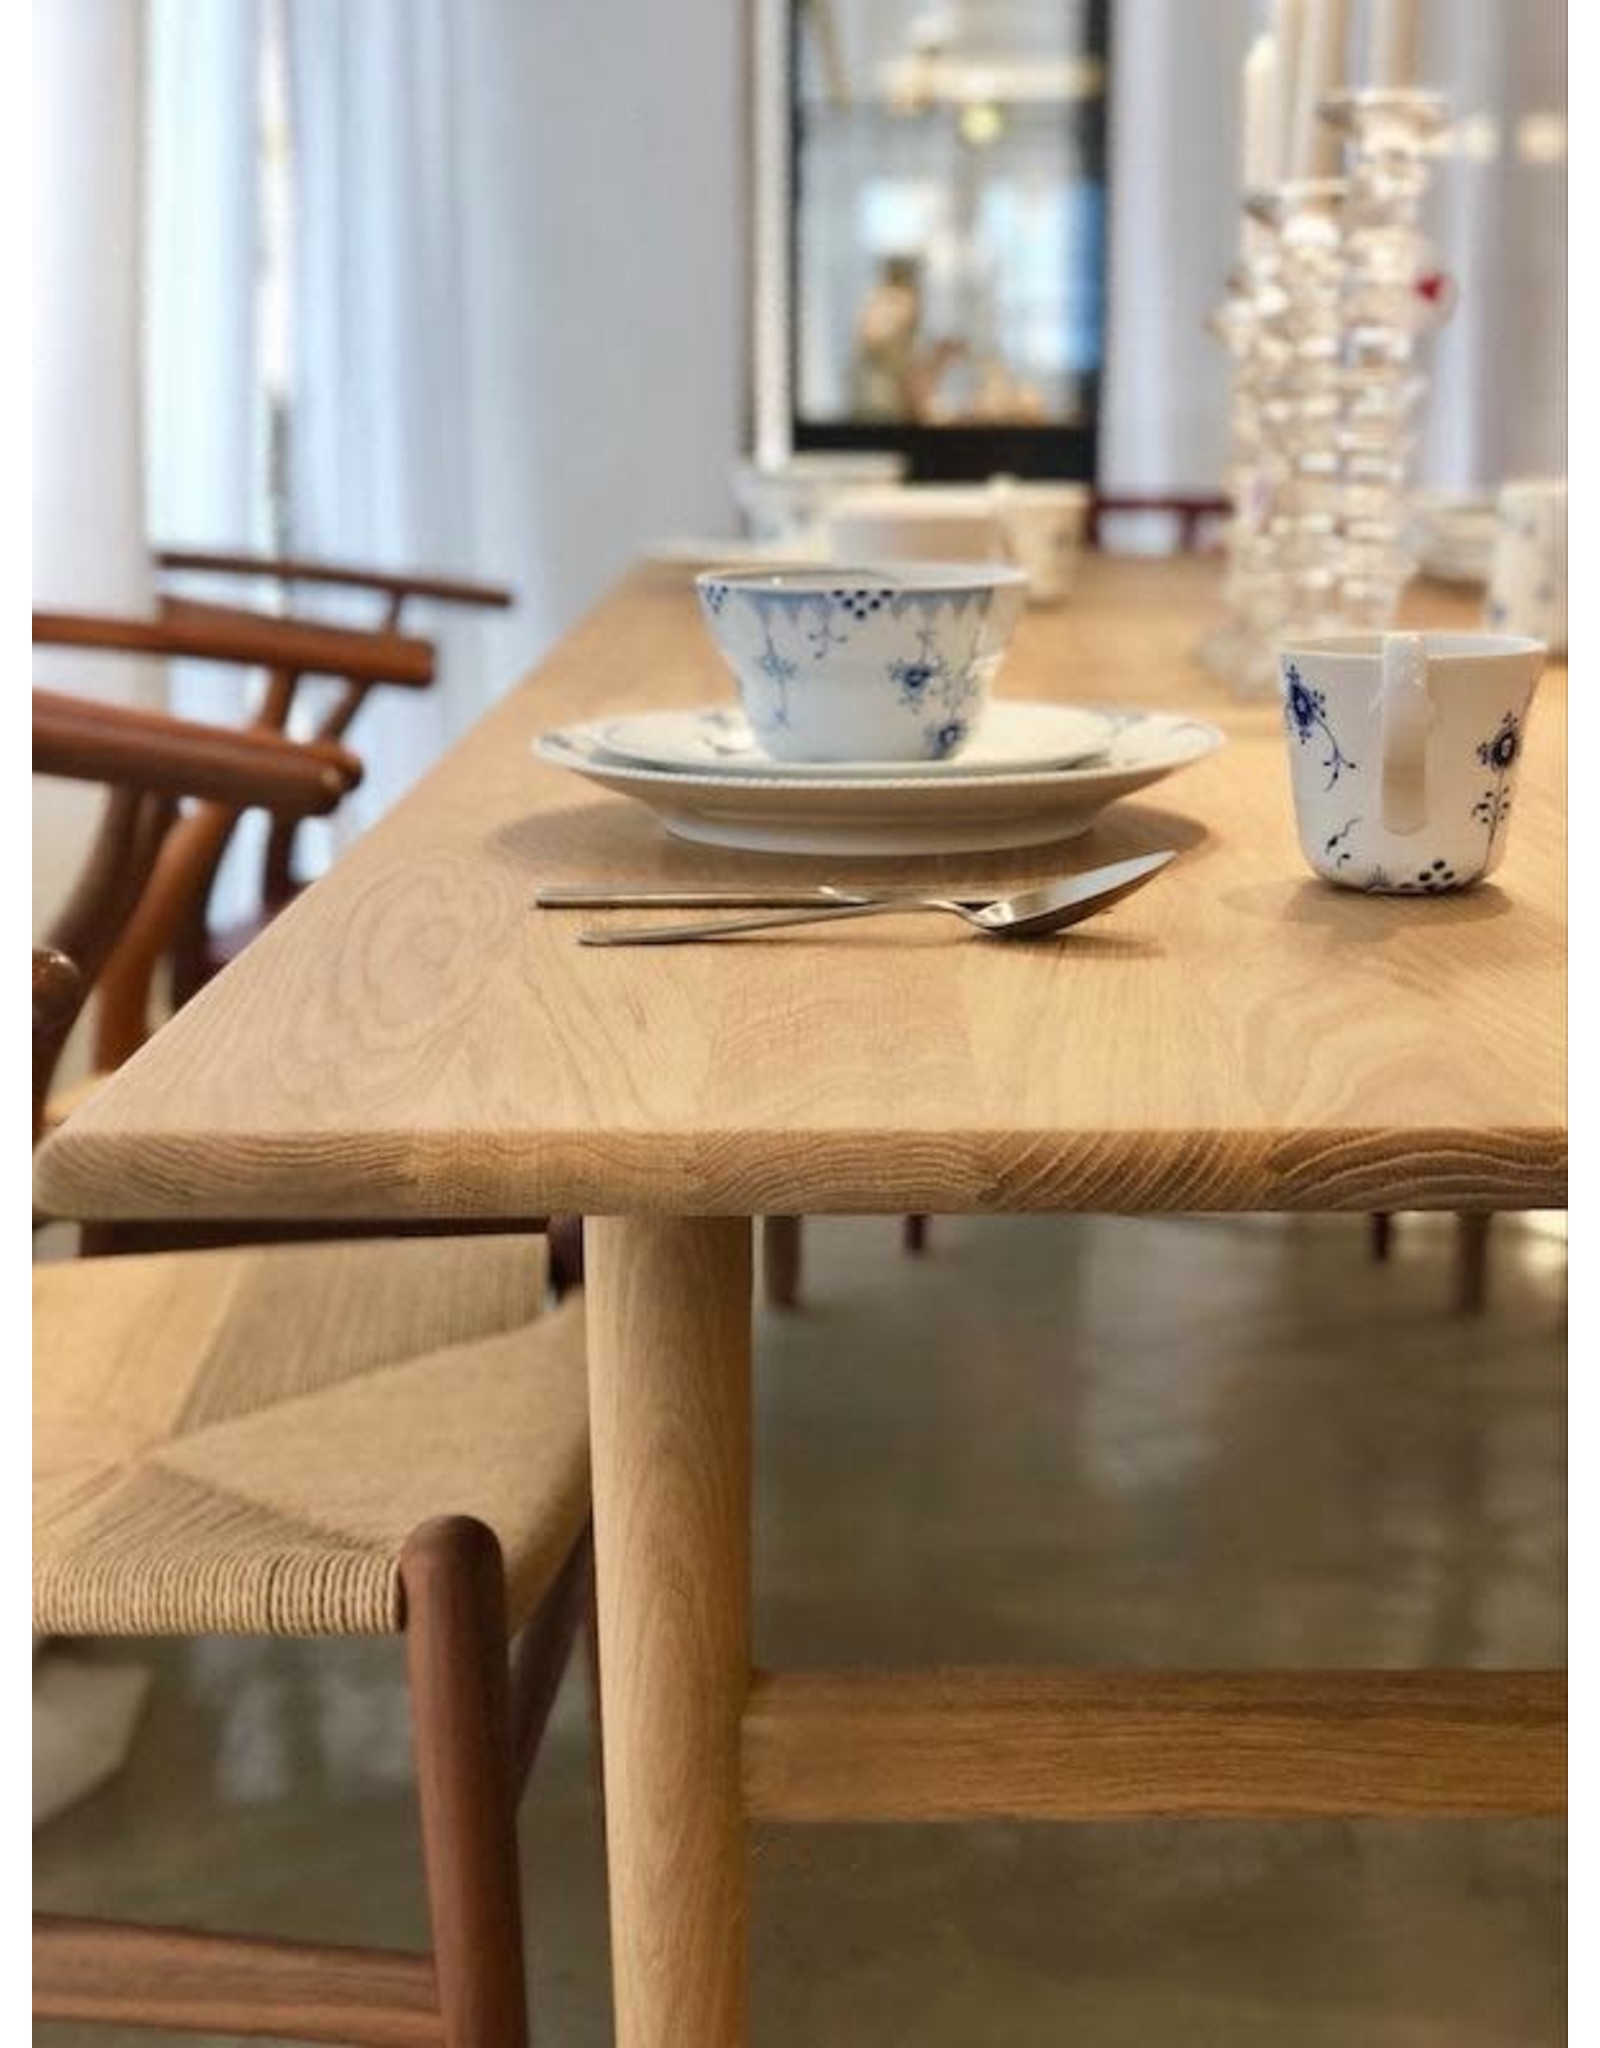 CARL HANSEN & SON CH327 DINING TABLE IN L248CM